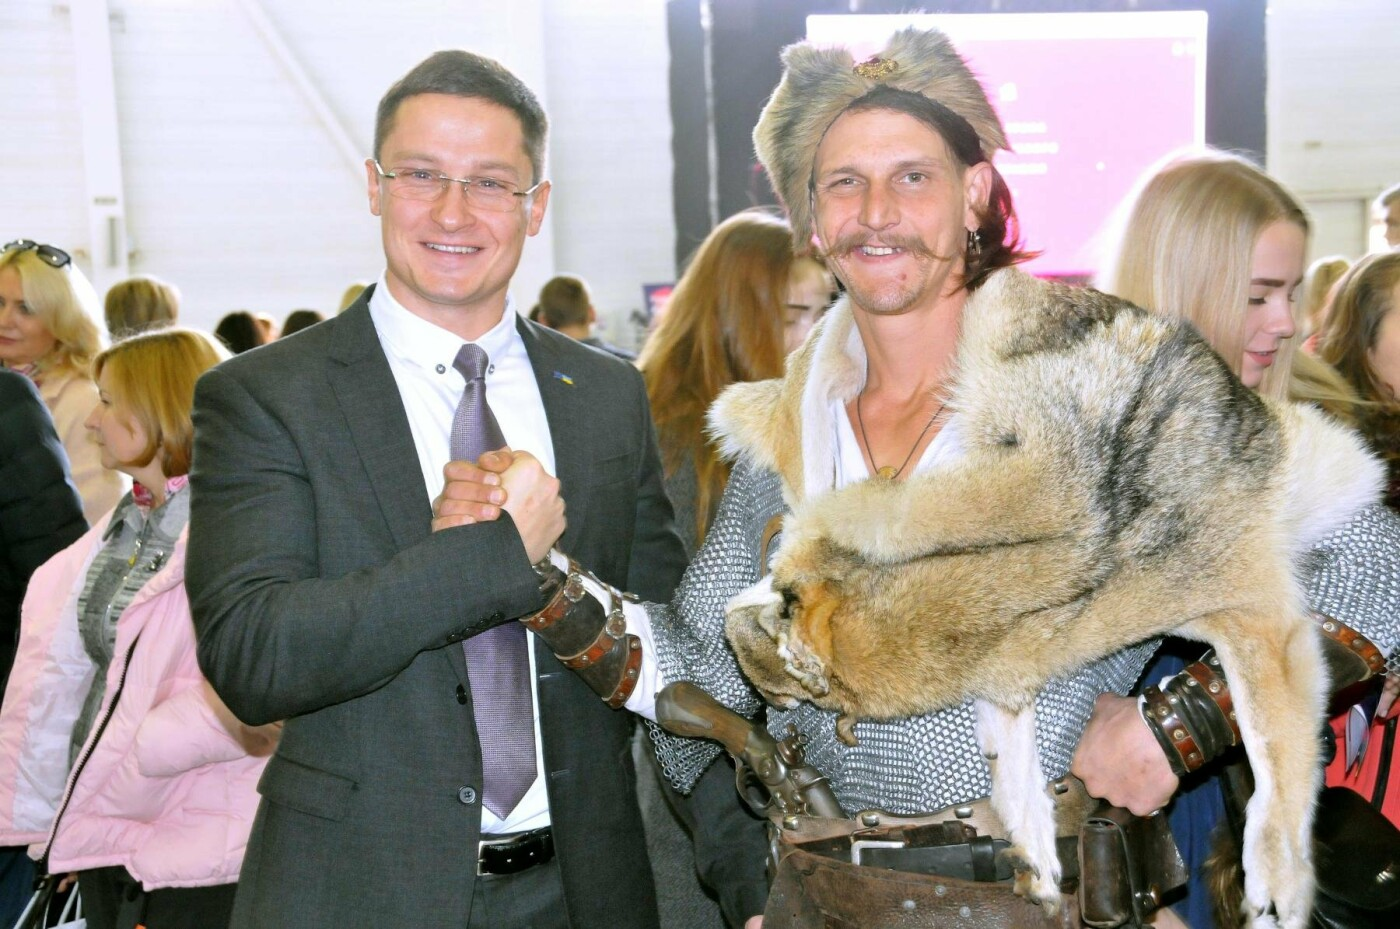 Владислав Марченко: «Запорожский край - перспективный центр туризма», фото-2